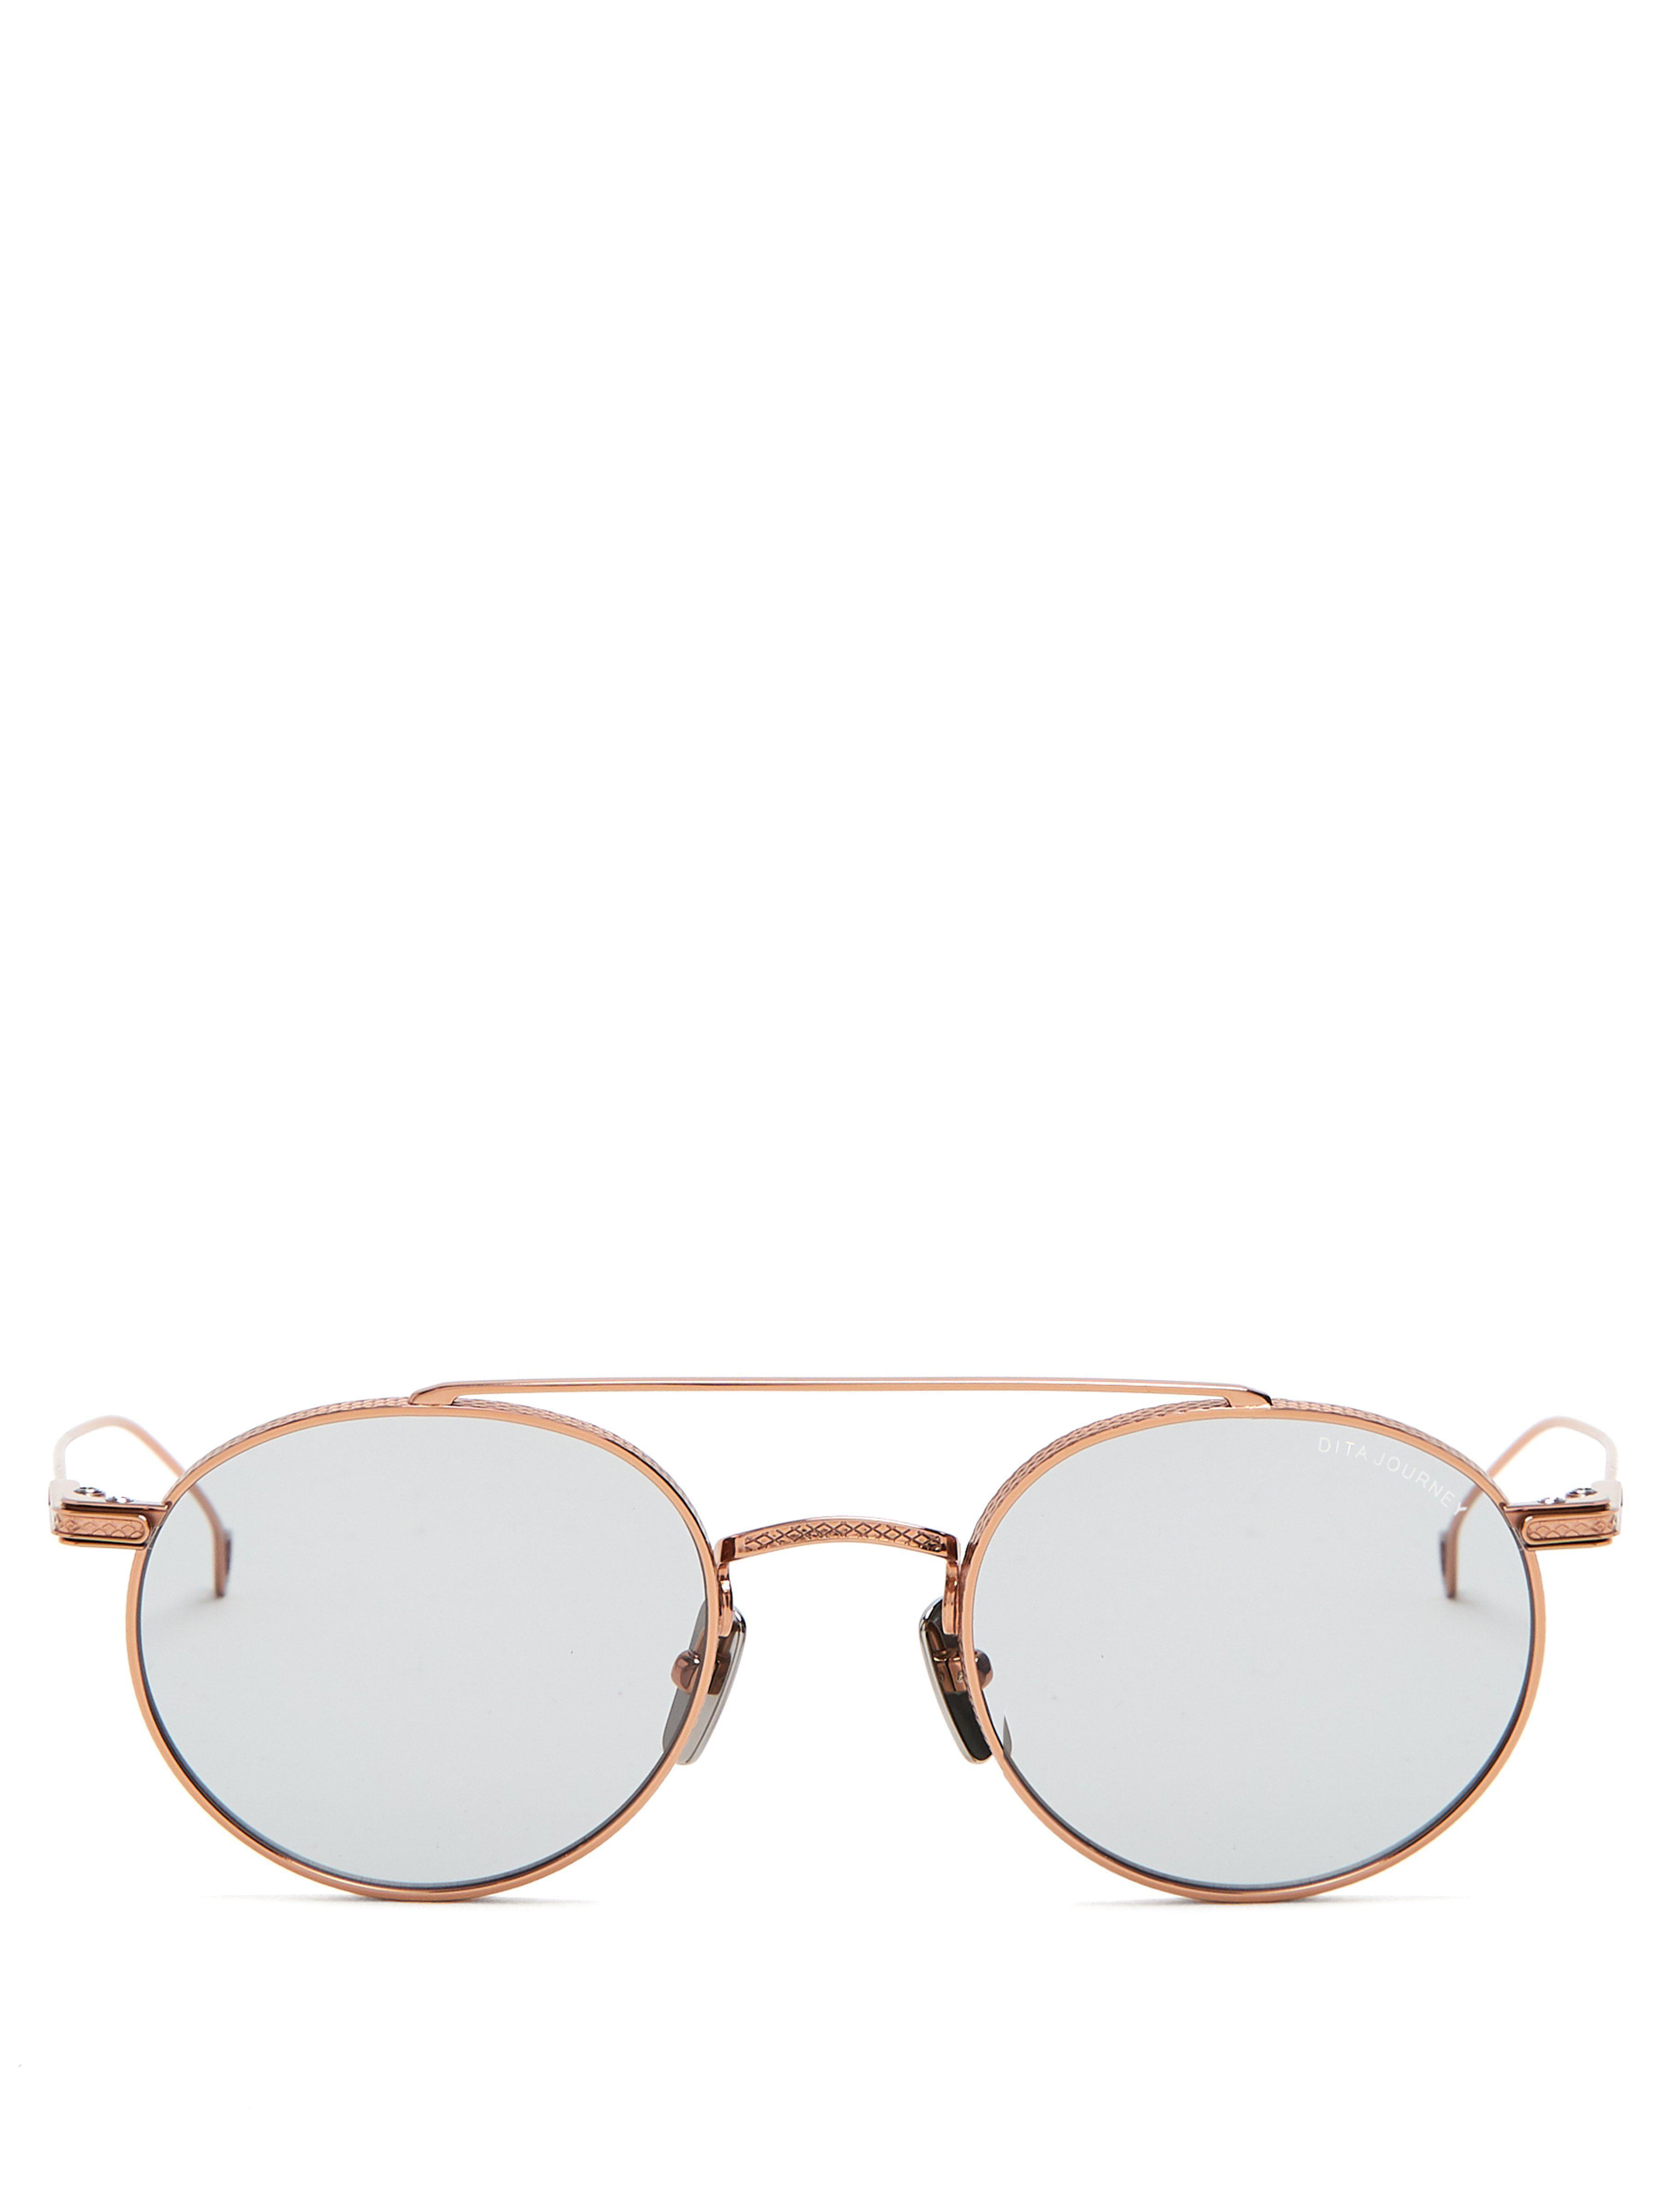 4a80e456c7 Dita Eyewear Journey Round Frame Sunglasses in Metallic for Men - Lyst